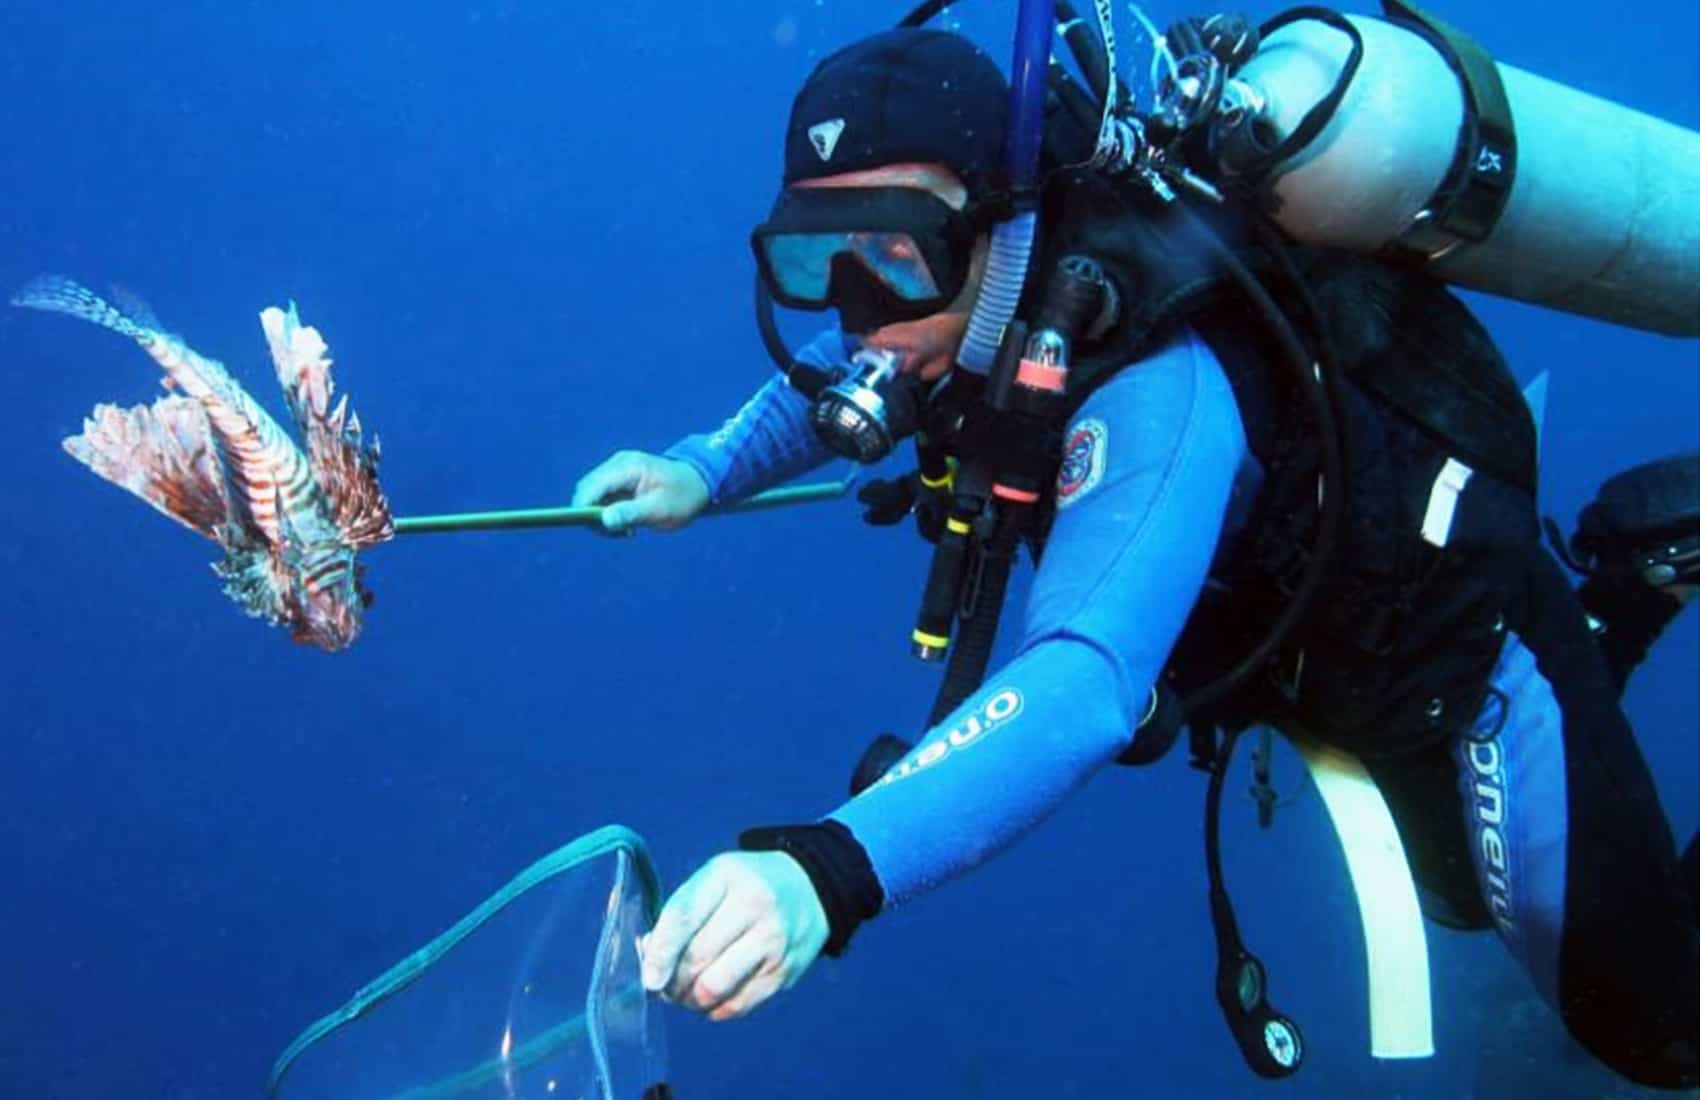 Broadbarred firefish